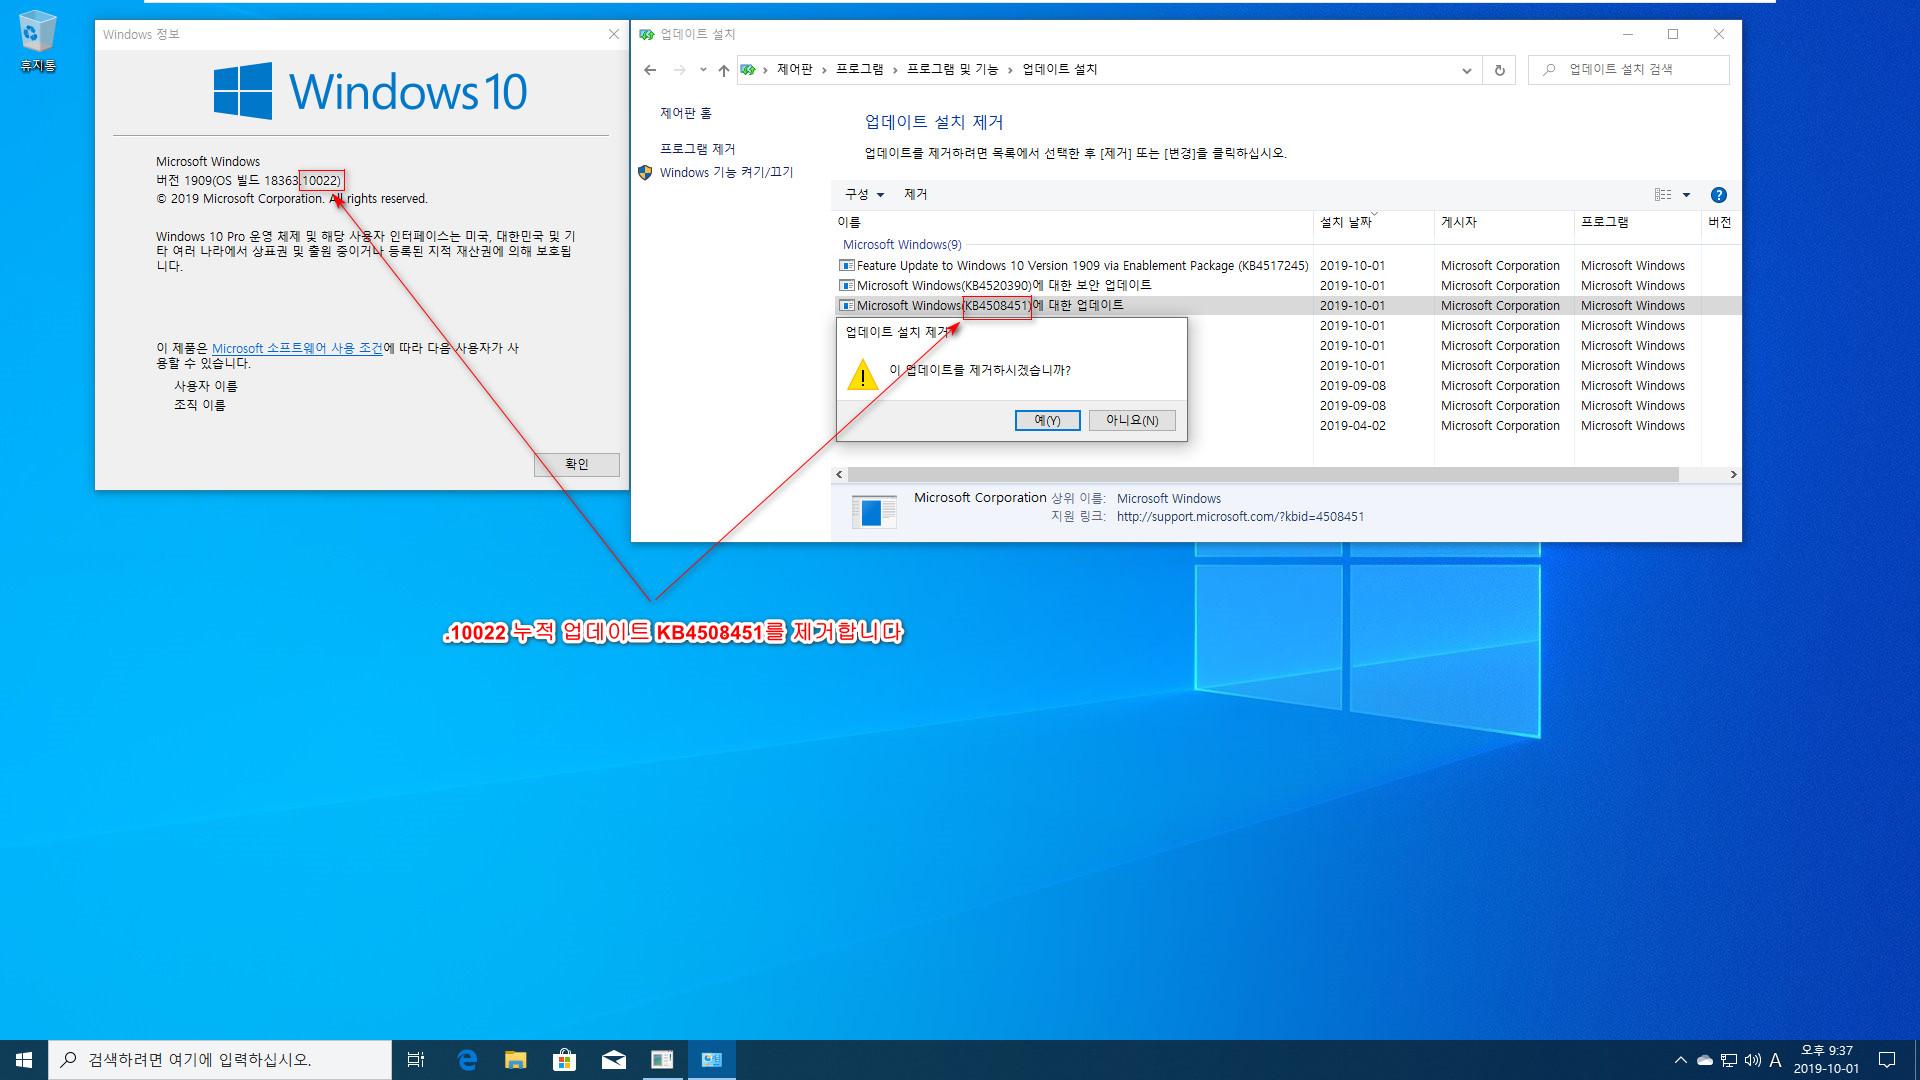 Windows 10 버전 1903 (OS빌드 18362.10022)에서 버전 1909 (OS빌드 18363.387) 으로 변경하기 테스트 2019-10-01_213729.jpg